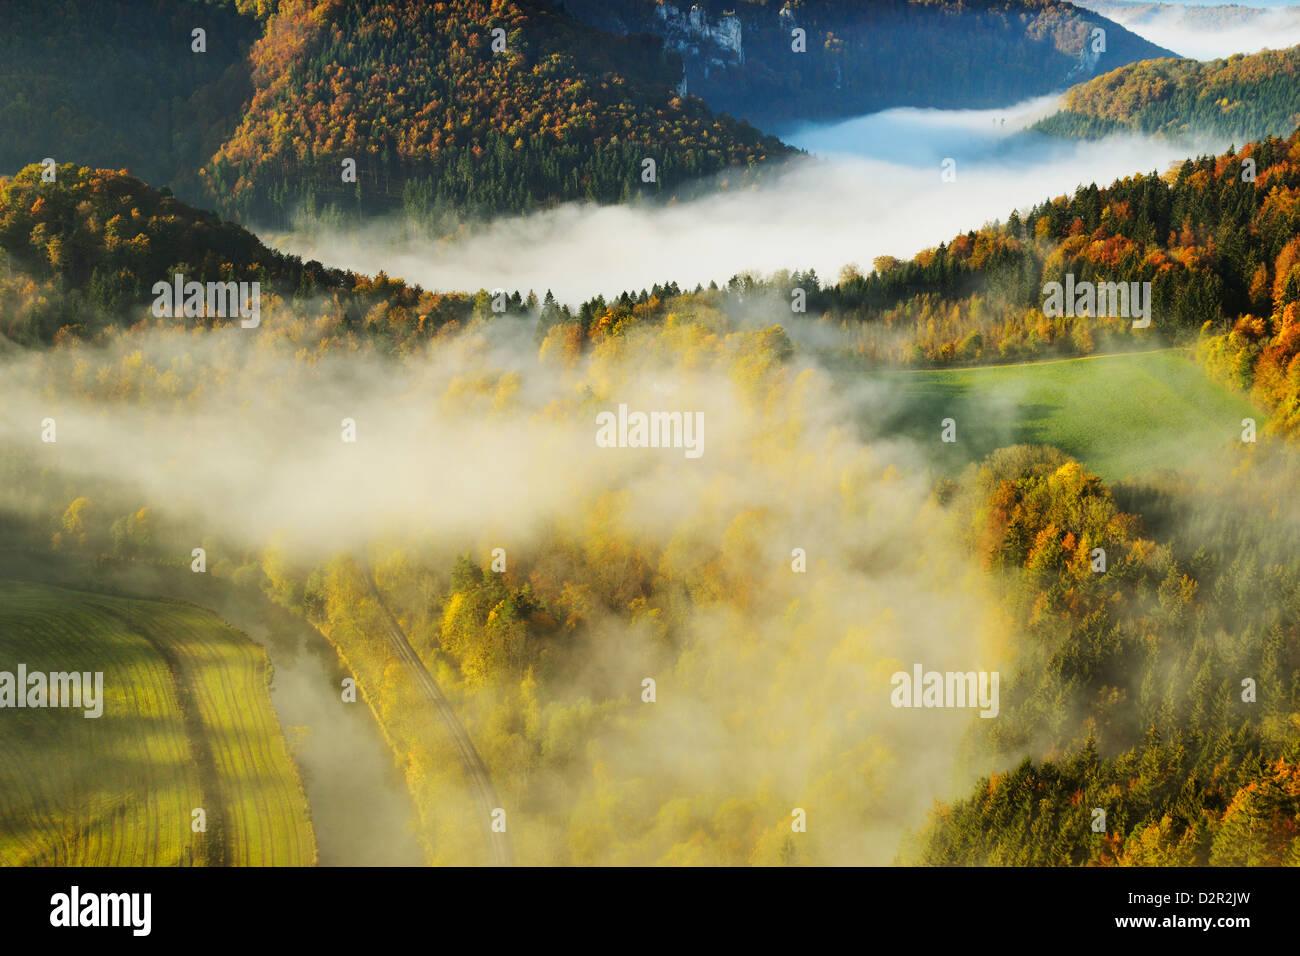 Vista desde Eichfelsen del Donautal (Valle del Danubio), cerca de Beuron, Baden-Wurttemberg, Alemania, Europa Imagen De Stock